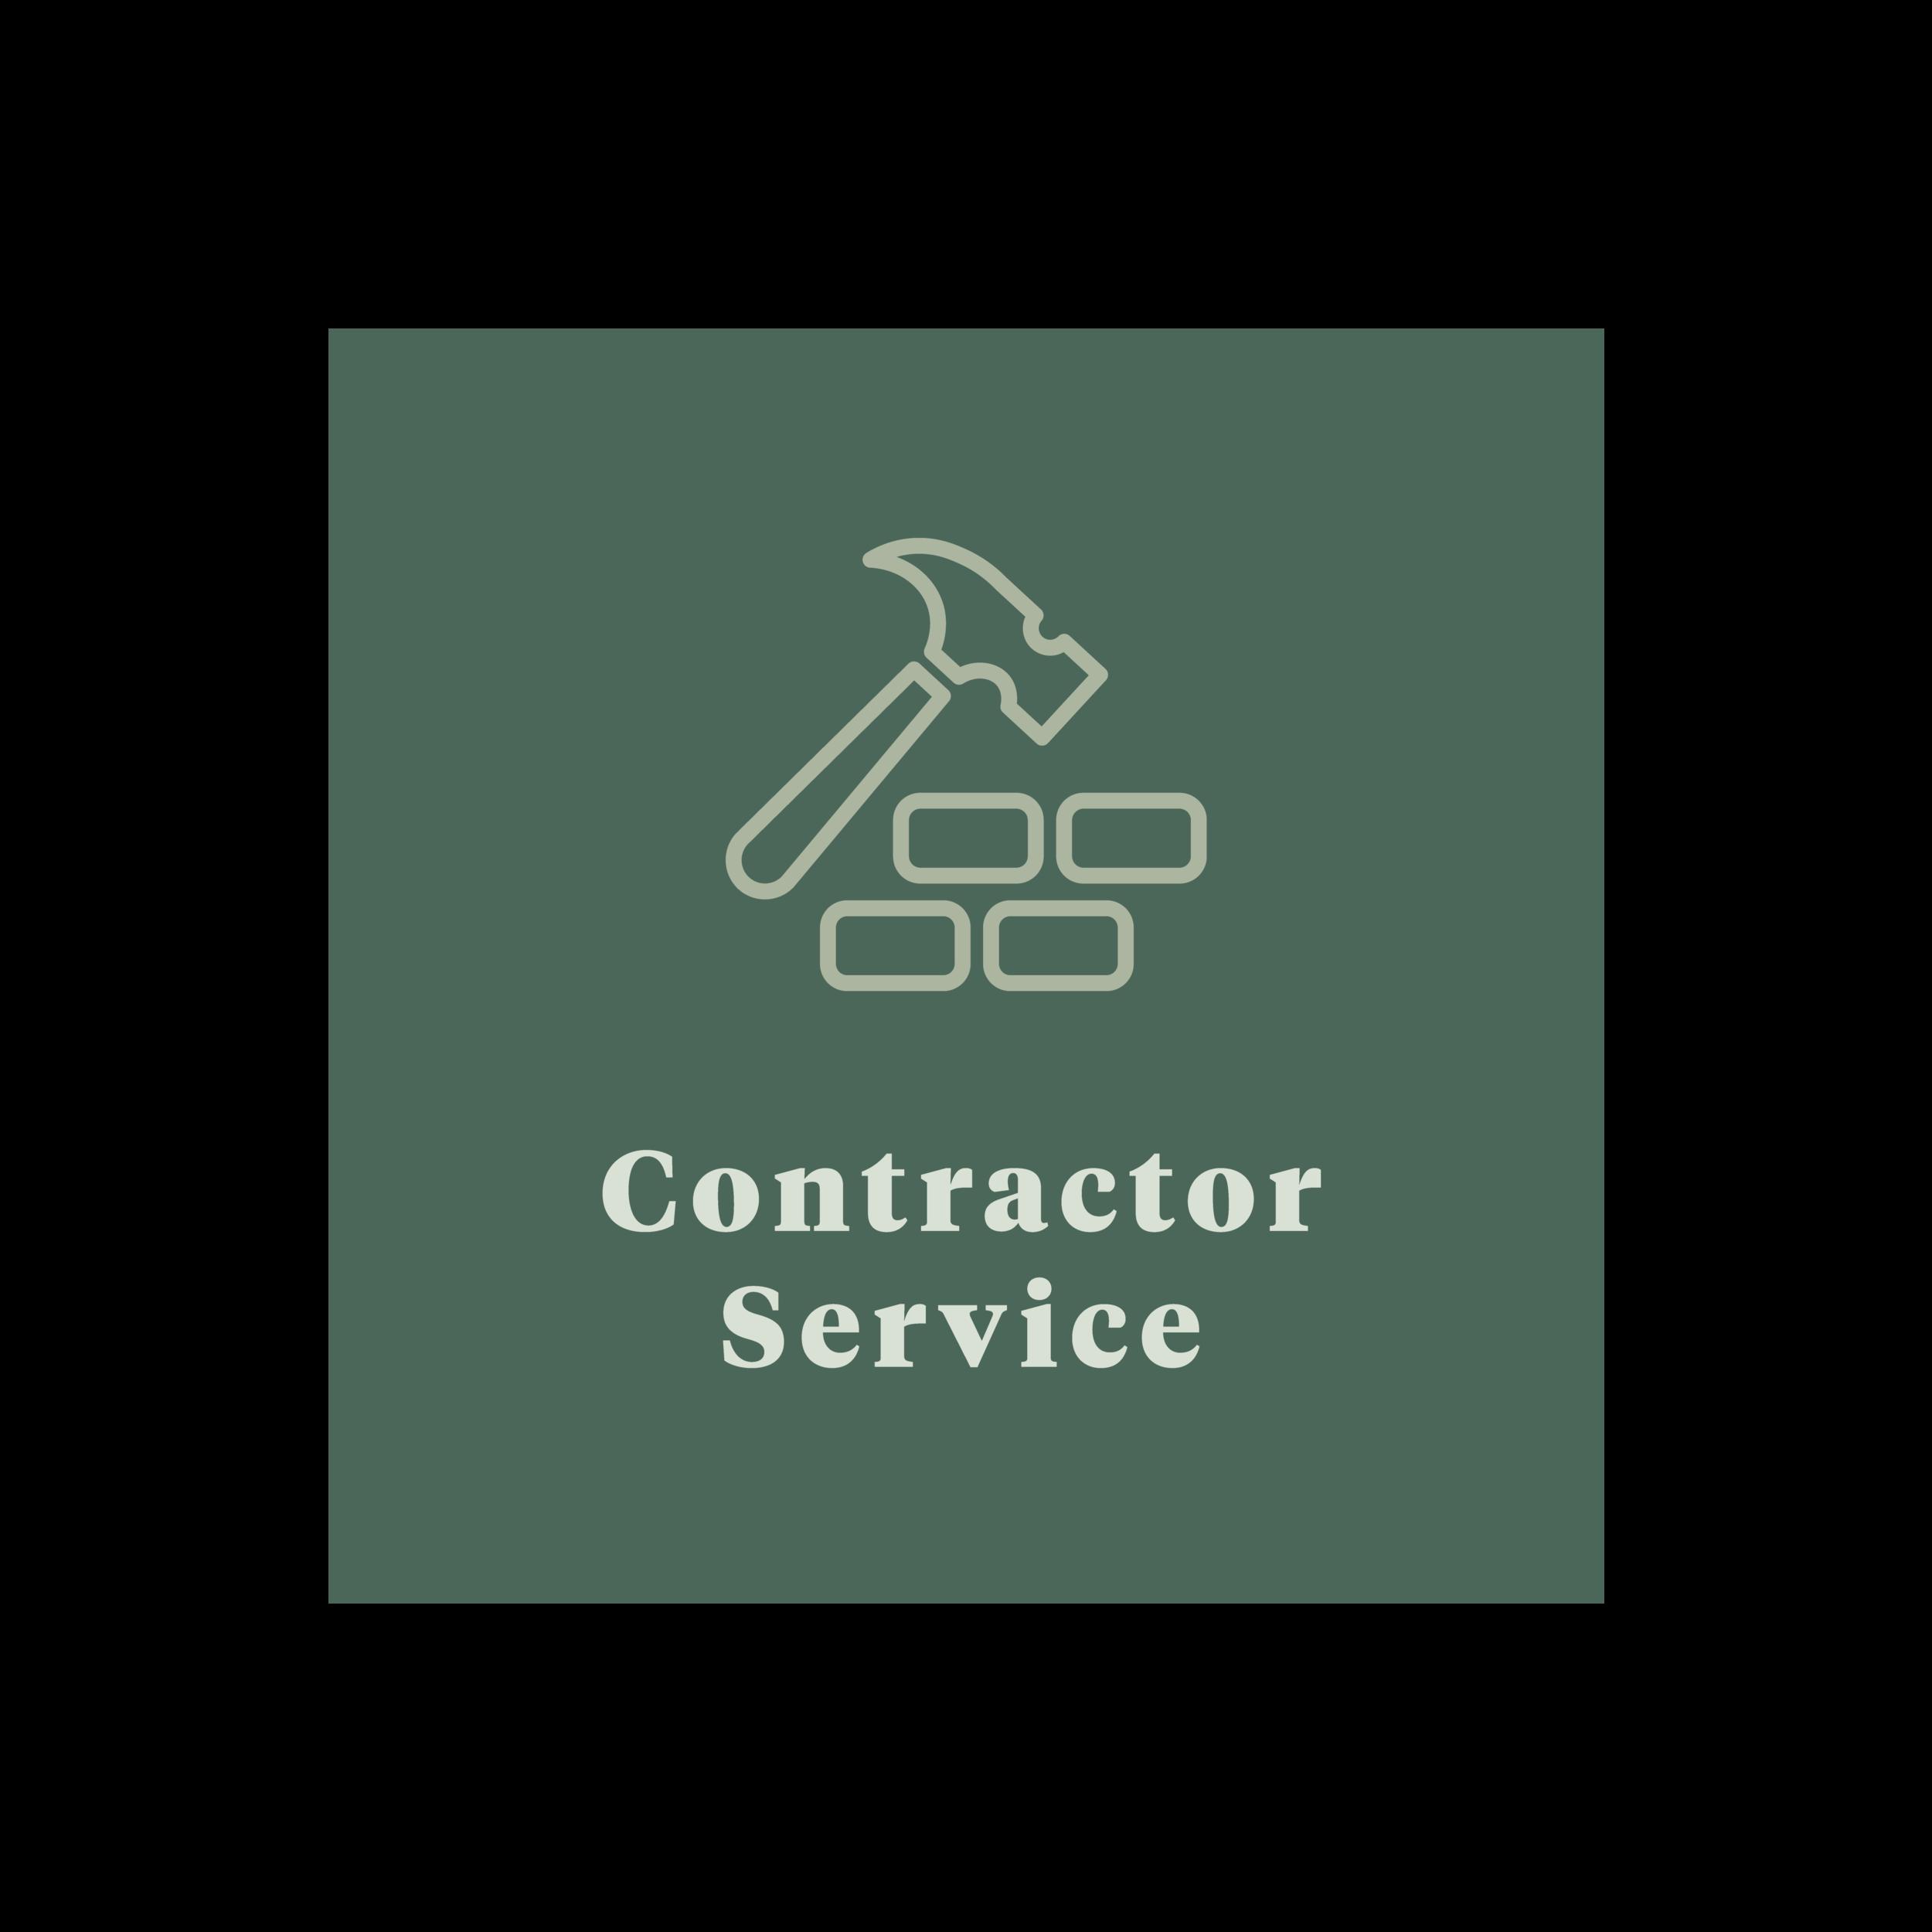 Park City Concierge Services - Contractor Service